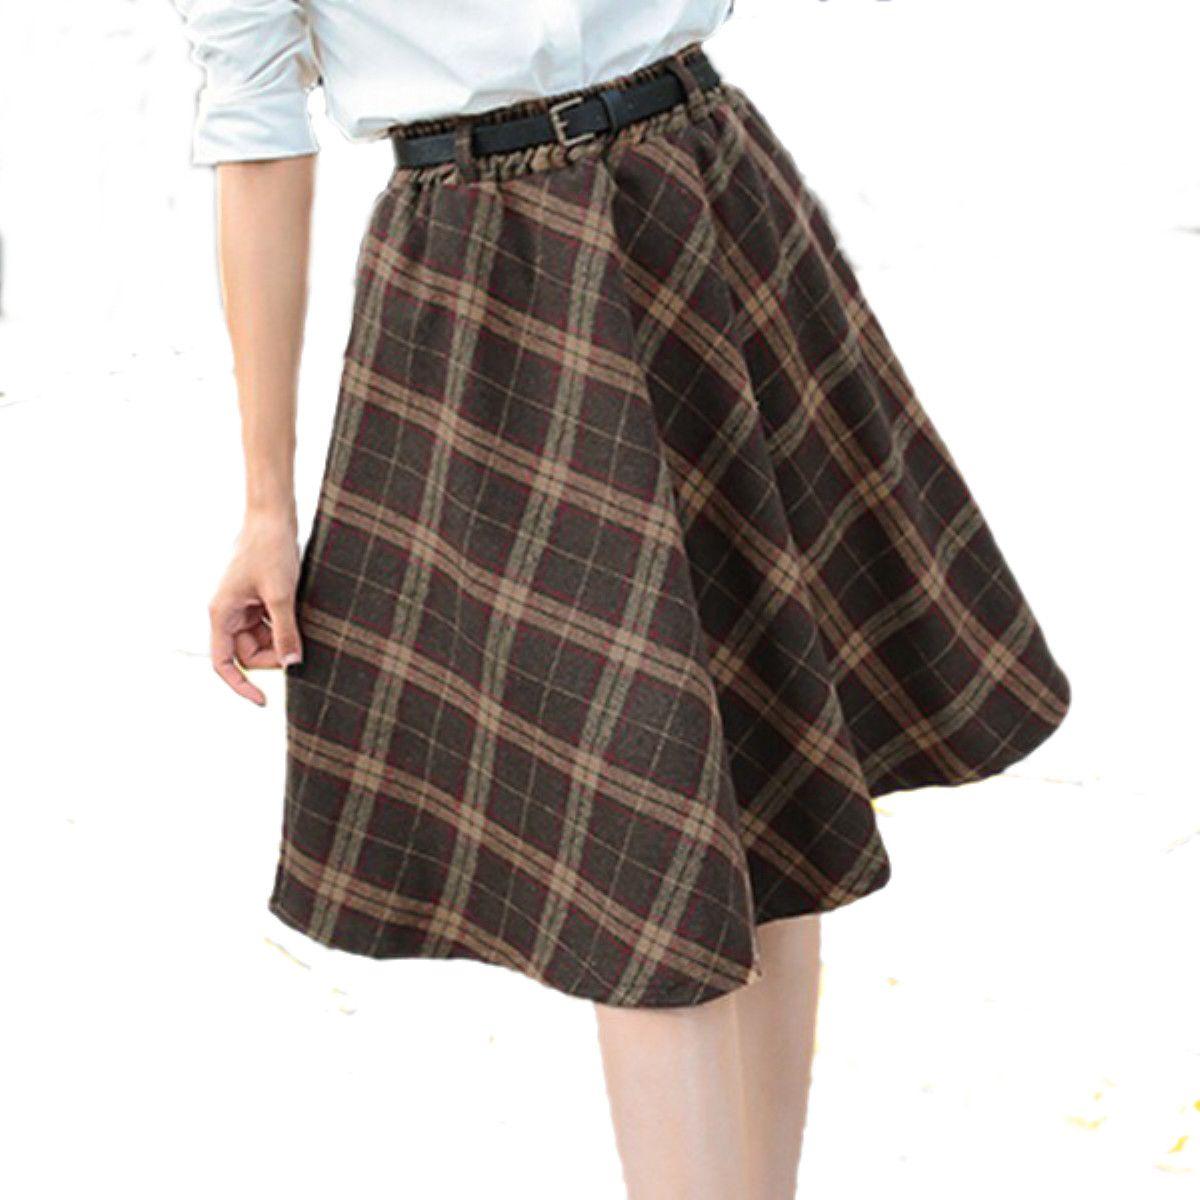 f7ed02db40 New Arrival Vintage Plaid Skirts Fashion 2015 Autumn&Winter Casual Pleated High  Waist Midi Women Knee-Length Belt Skirt 6 Colors